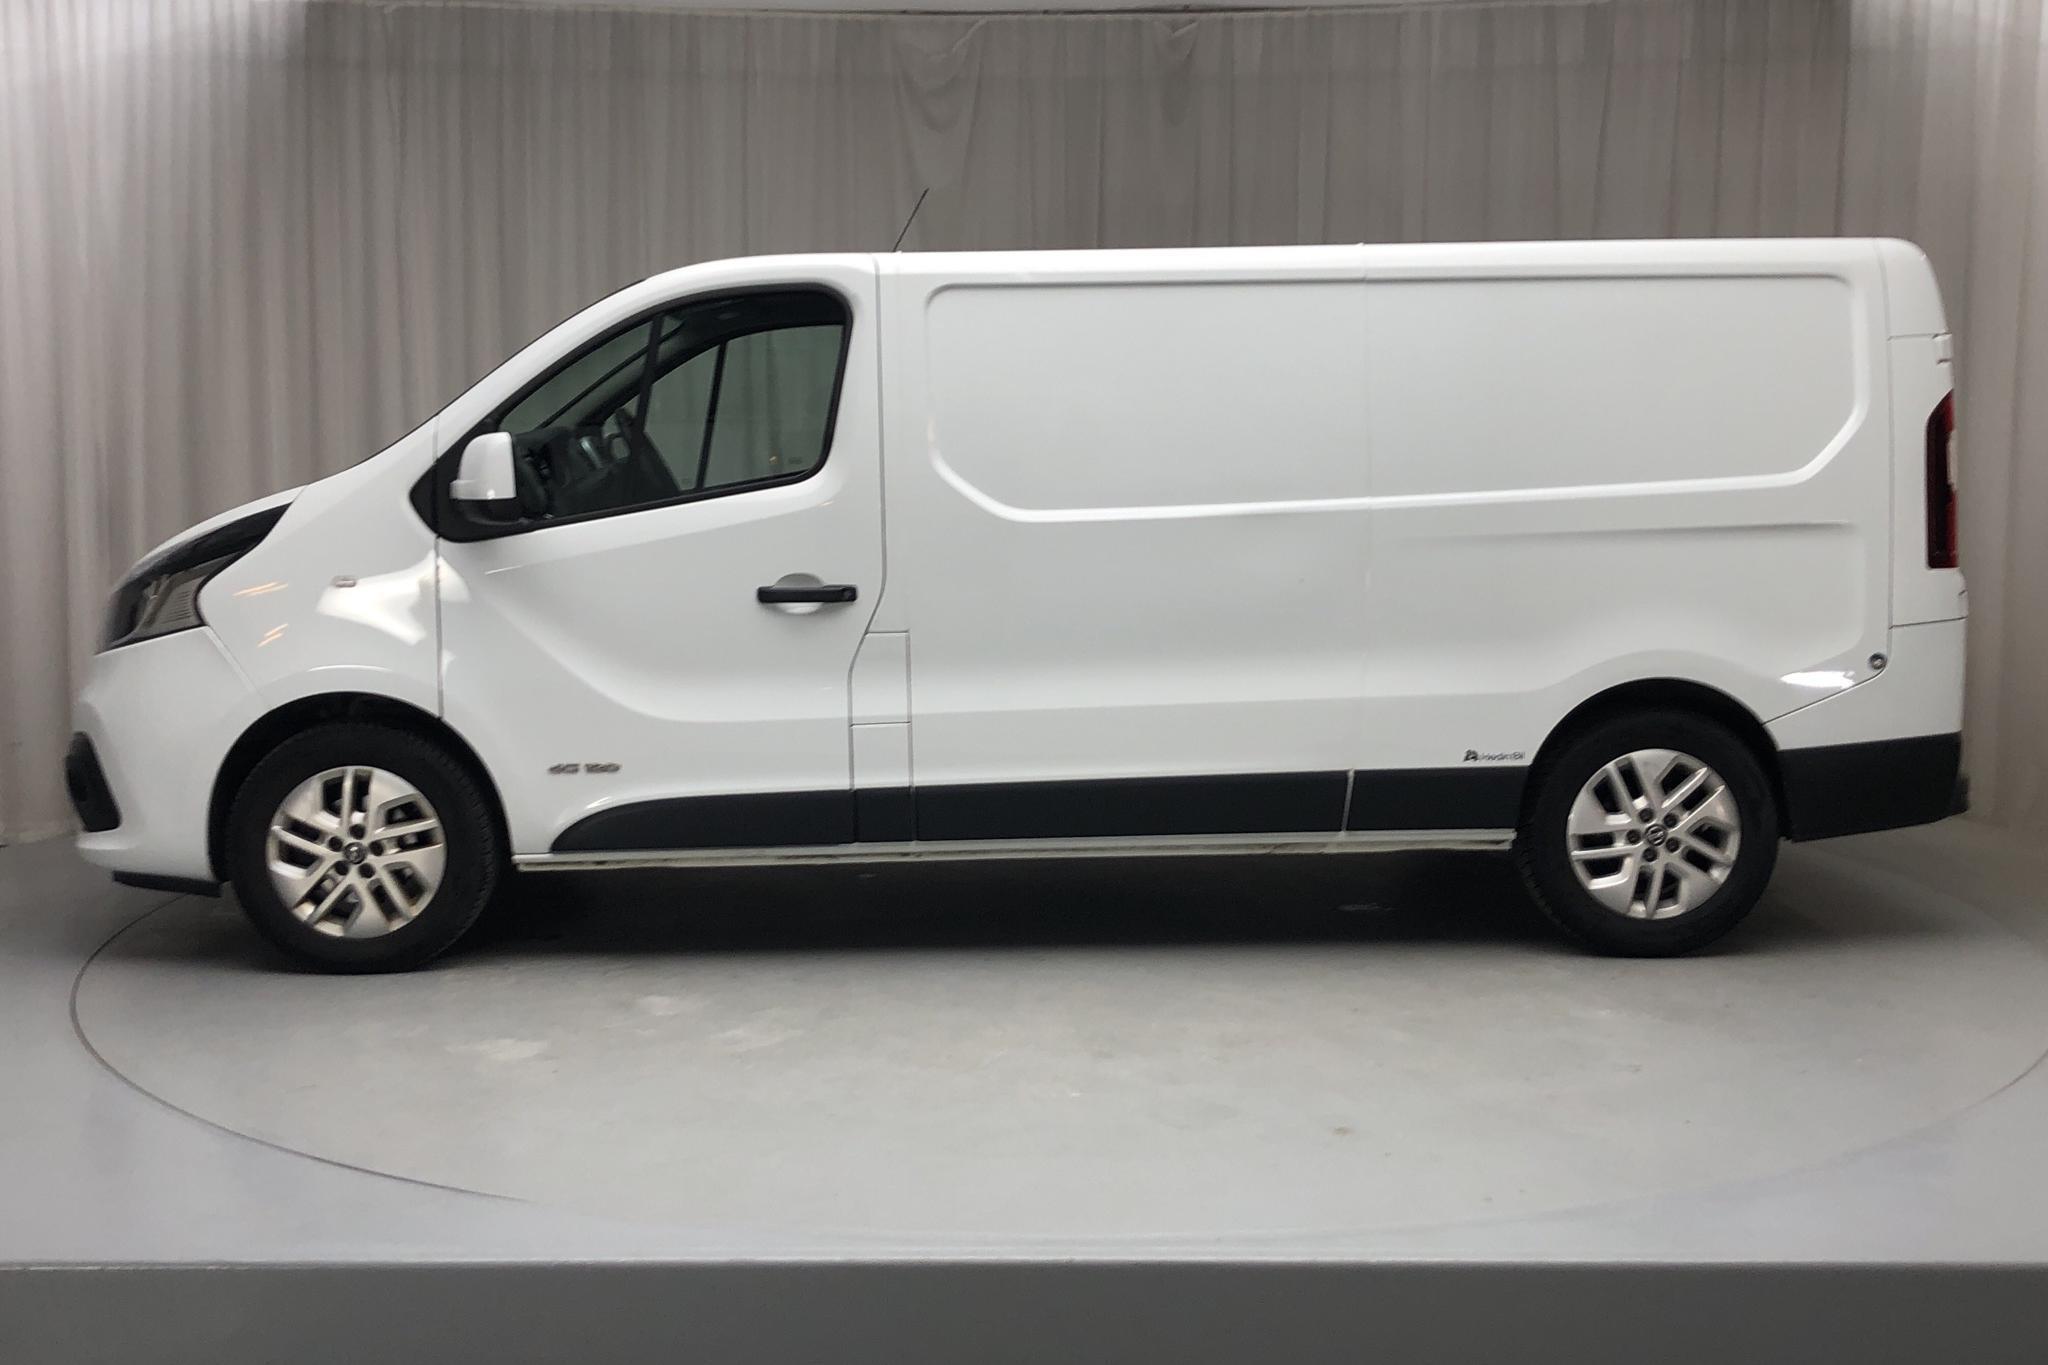 Nissan NV300 1.6 dCi (120hk) - 8 479 mil - Manuell - vit - 2017